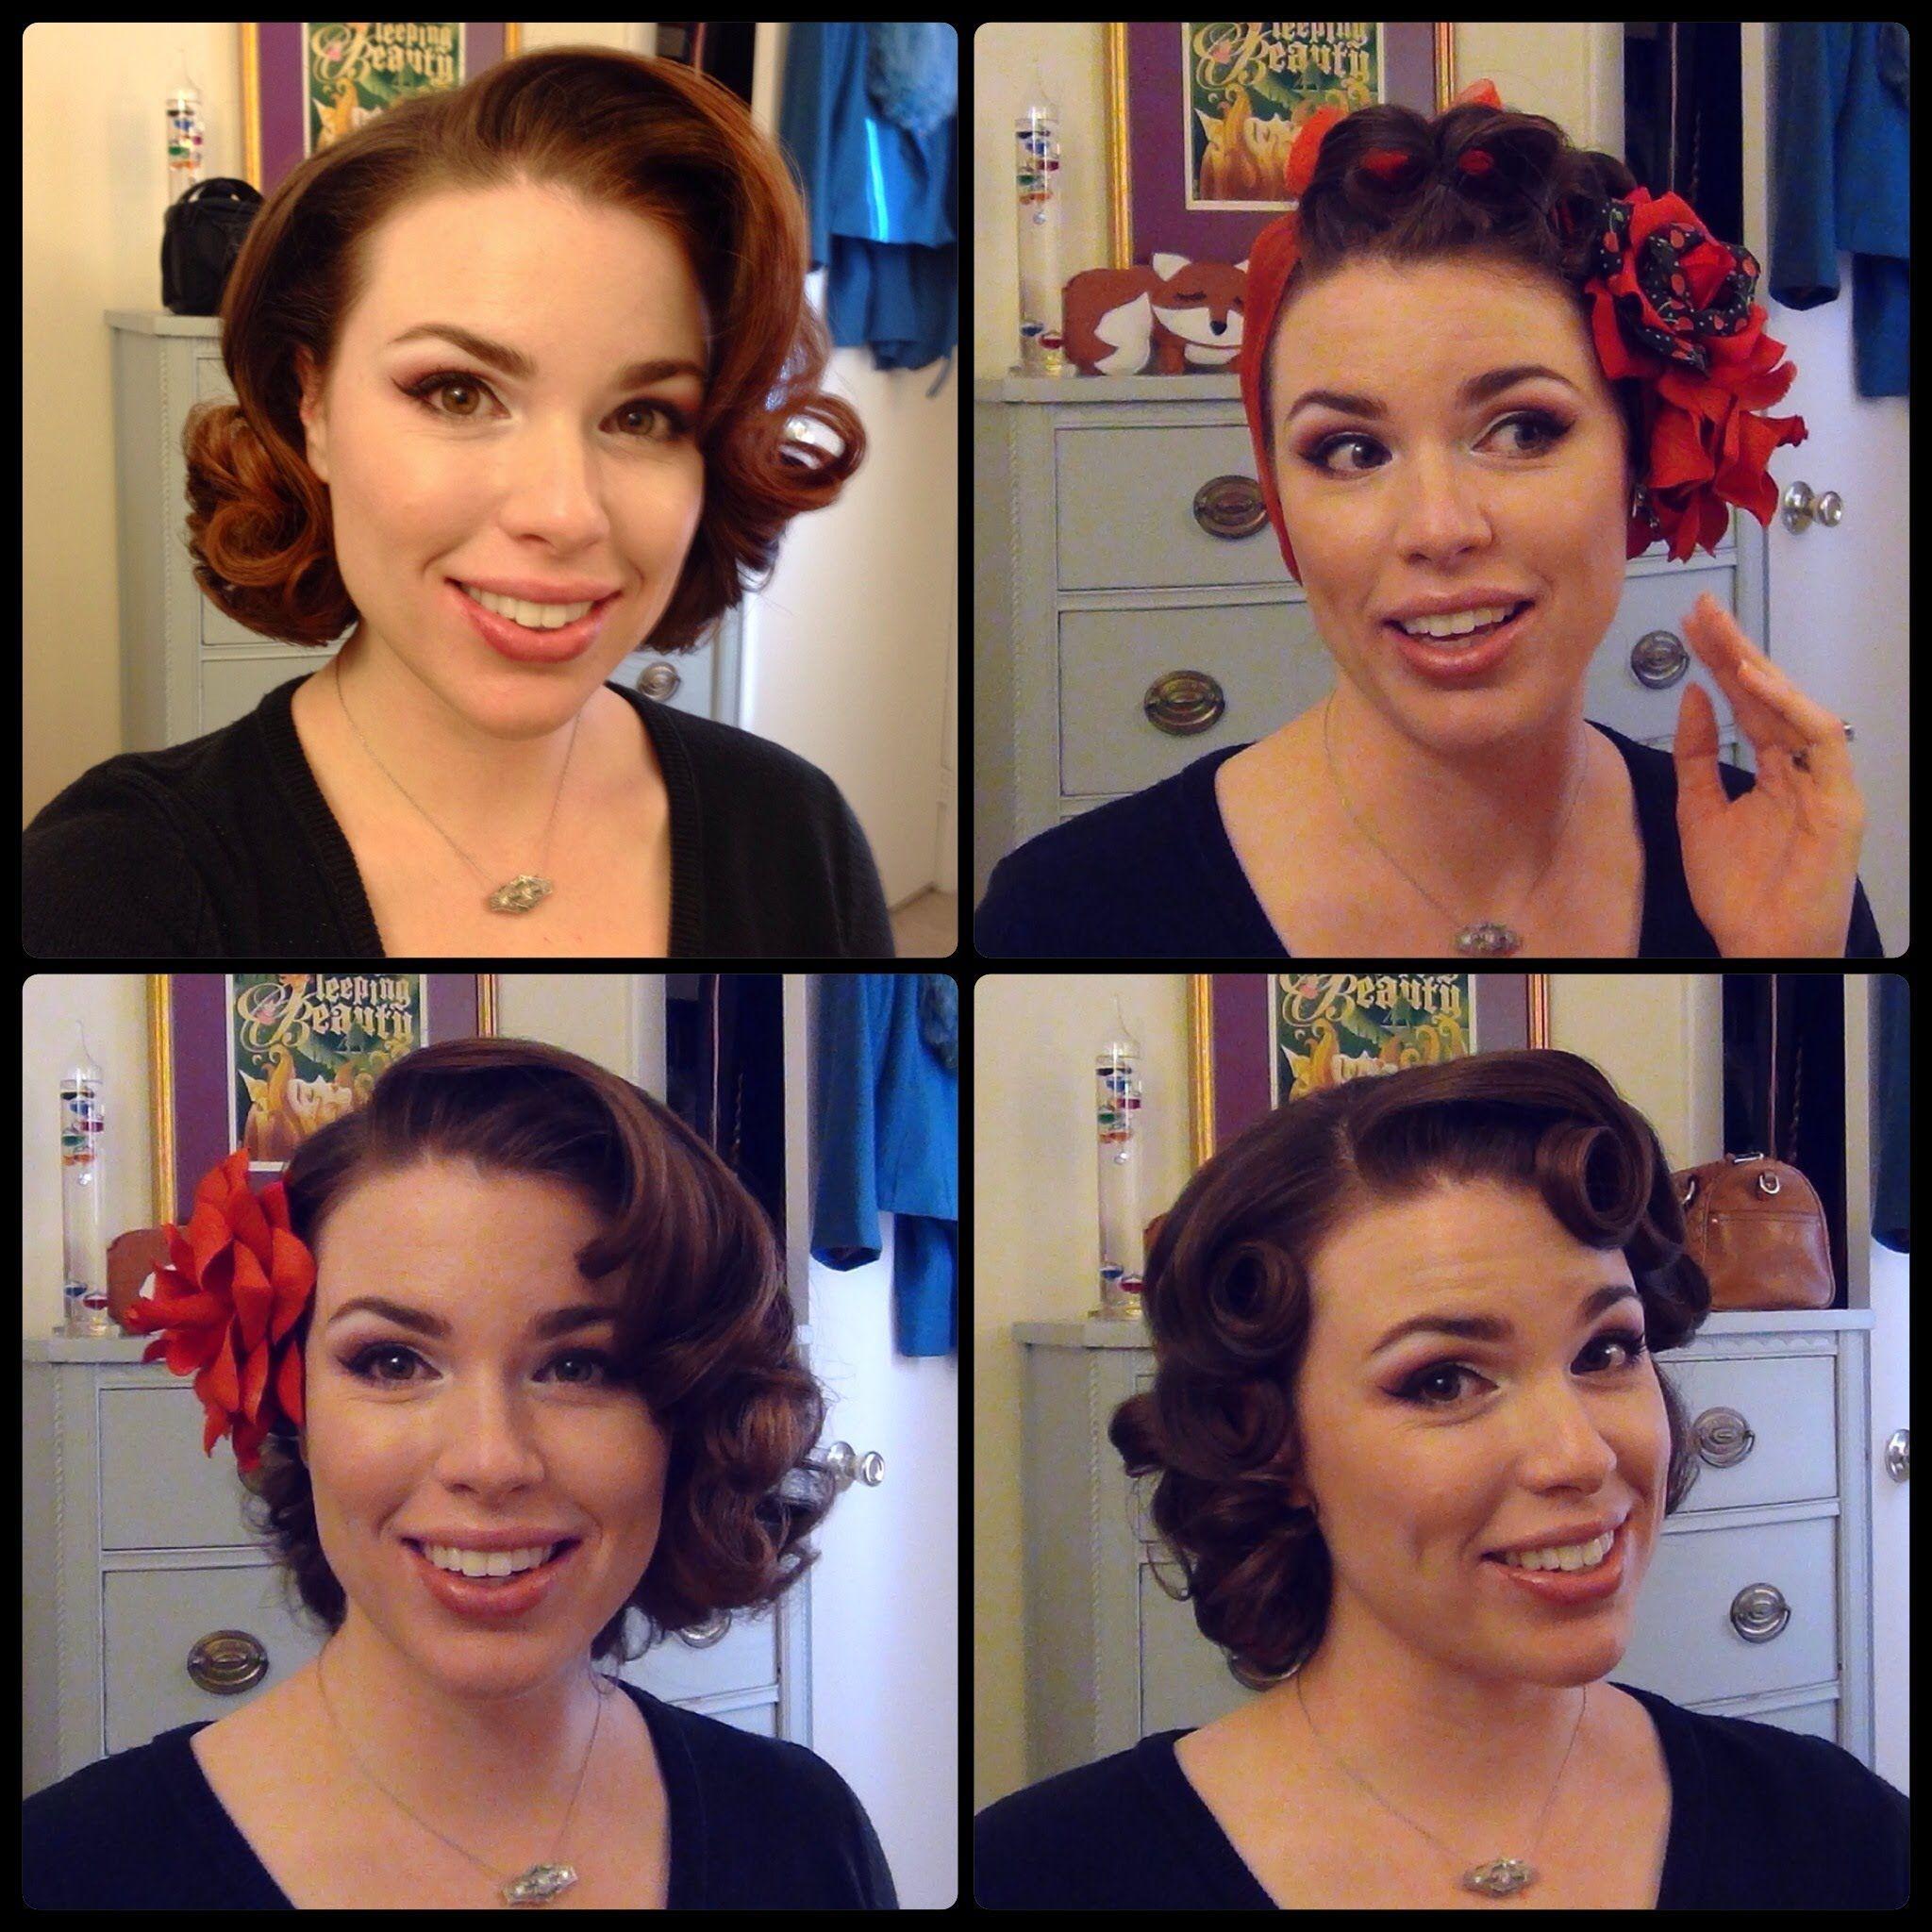 Glorious Vintage Retro Updos Hairstyle Ideas In 2020 Short Hair Tutorial Medium Hair Styles 1950s Hairstyles